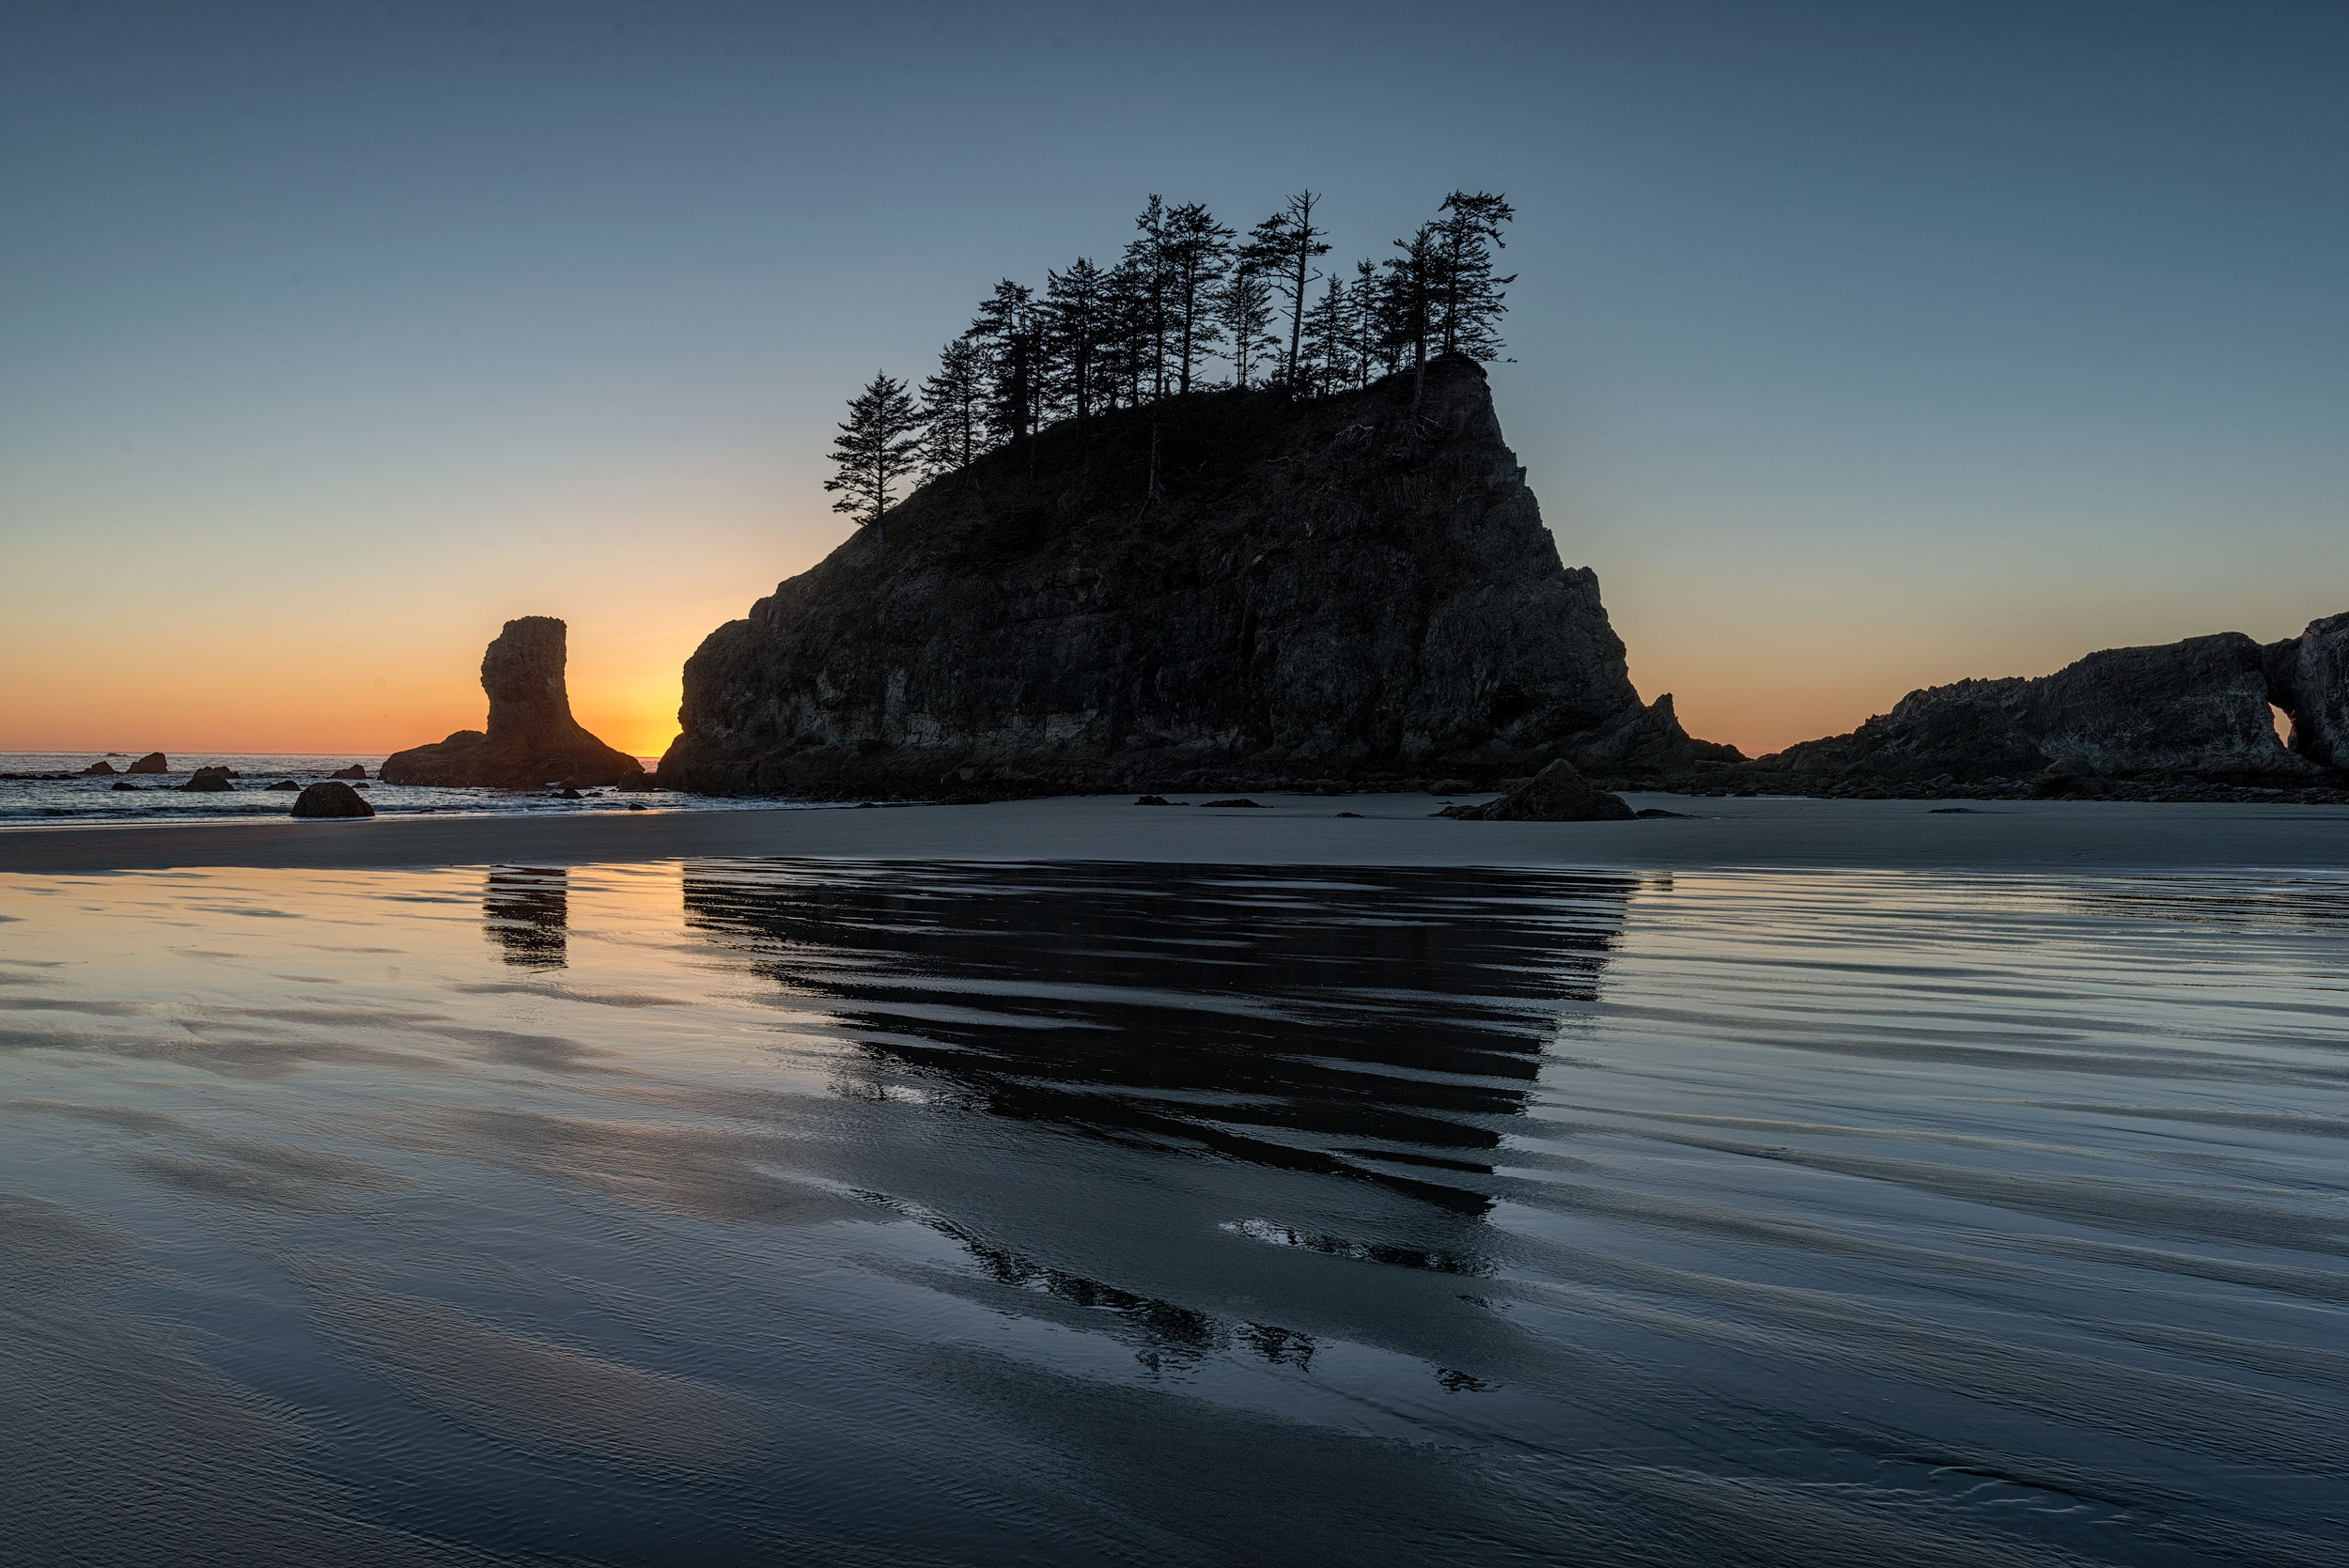 4/ Pacific Northwest